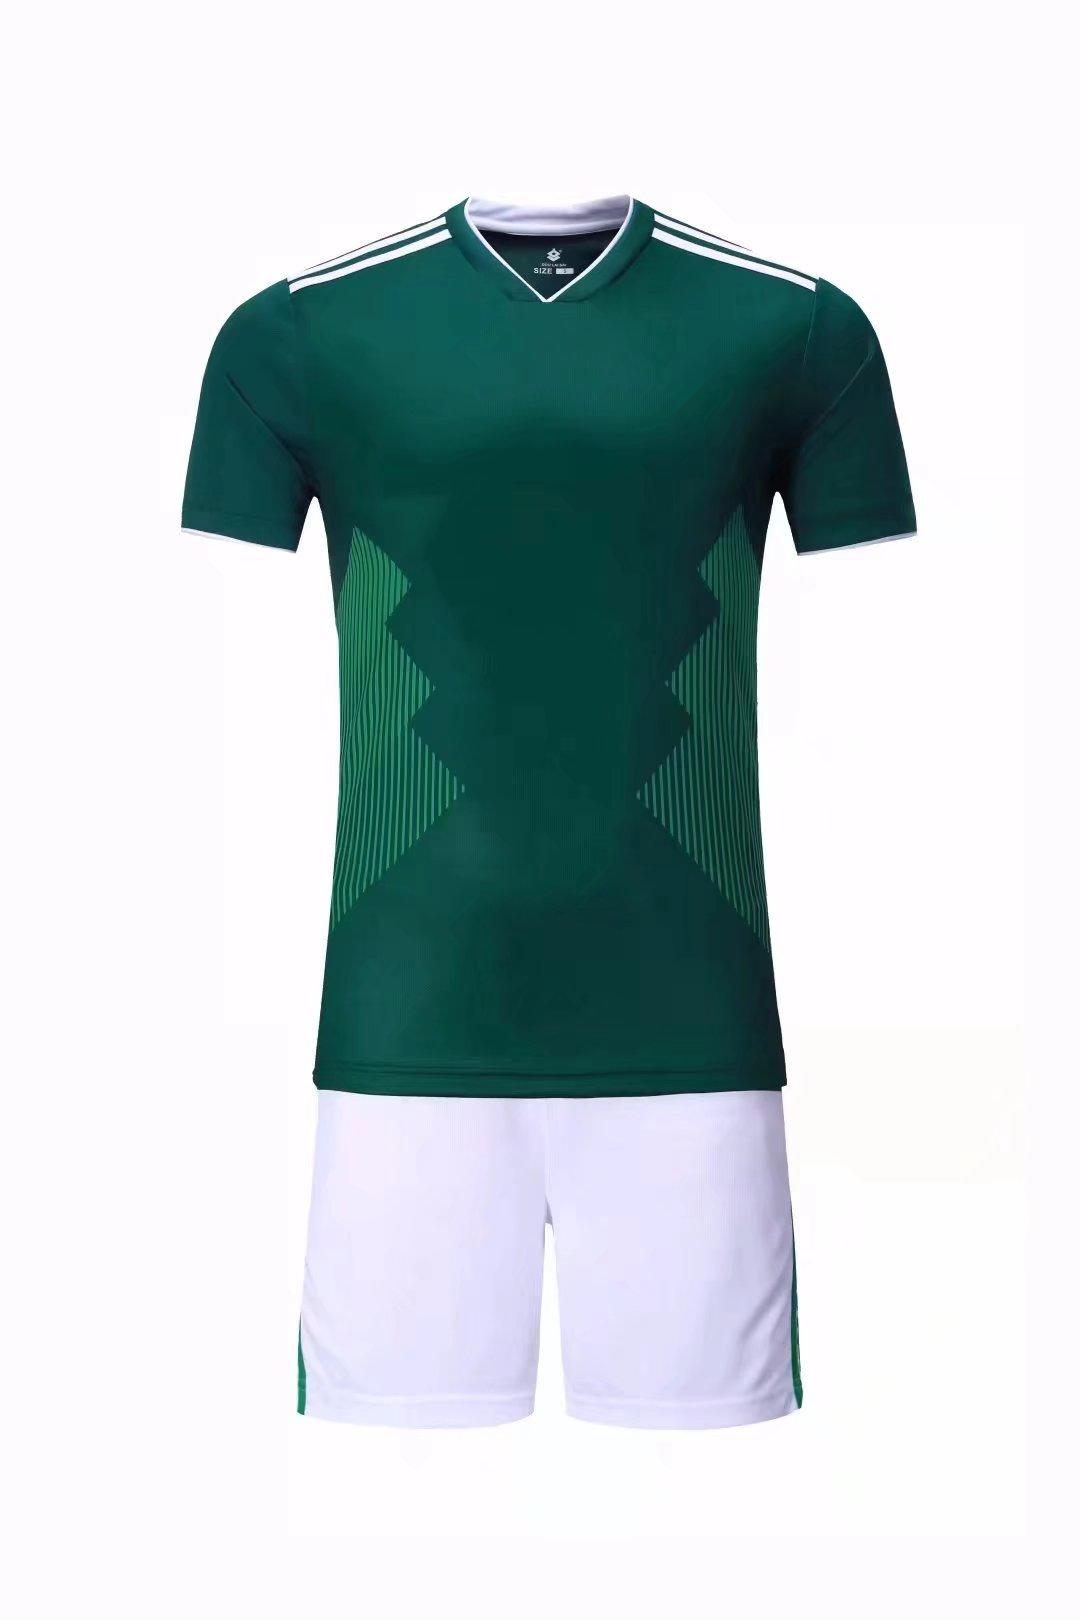 16a054c2488 2018 Adult Green Soccer Uniform Wholesale DIY Football Team Kits Custom  Soccer Shirts Online